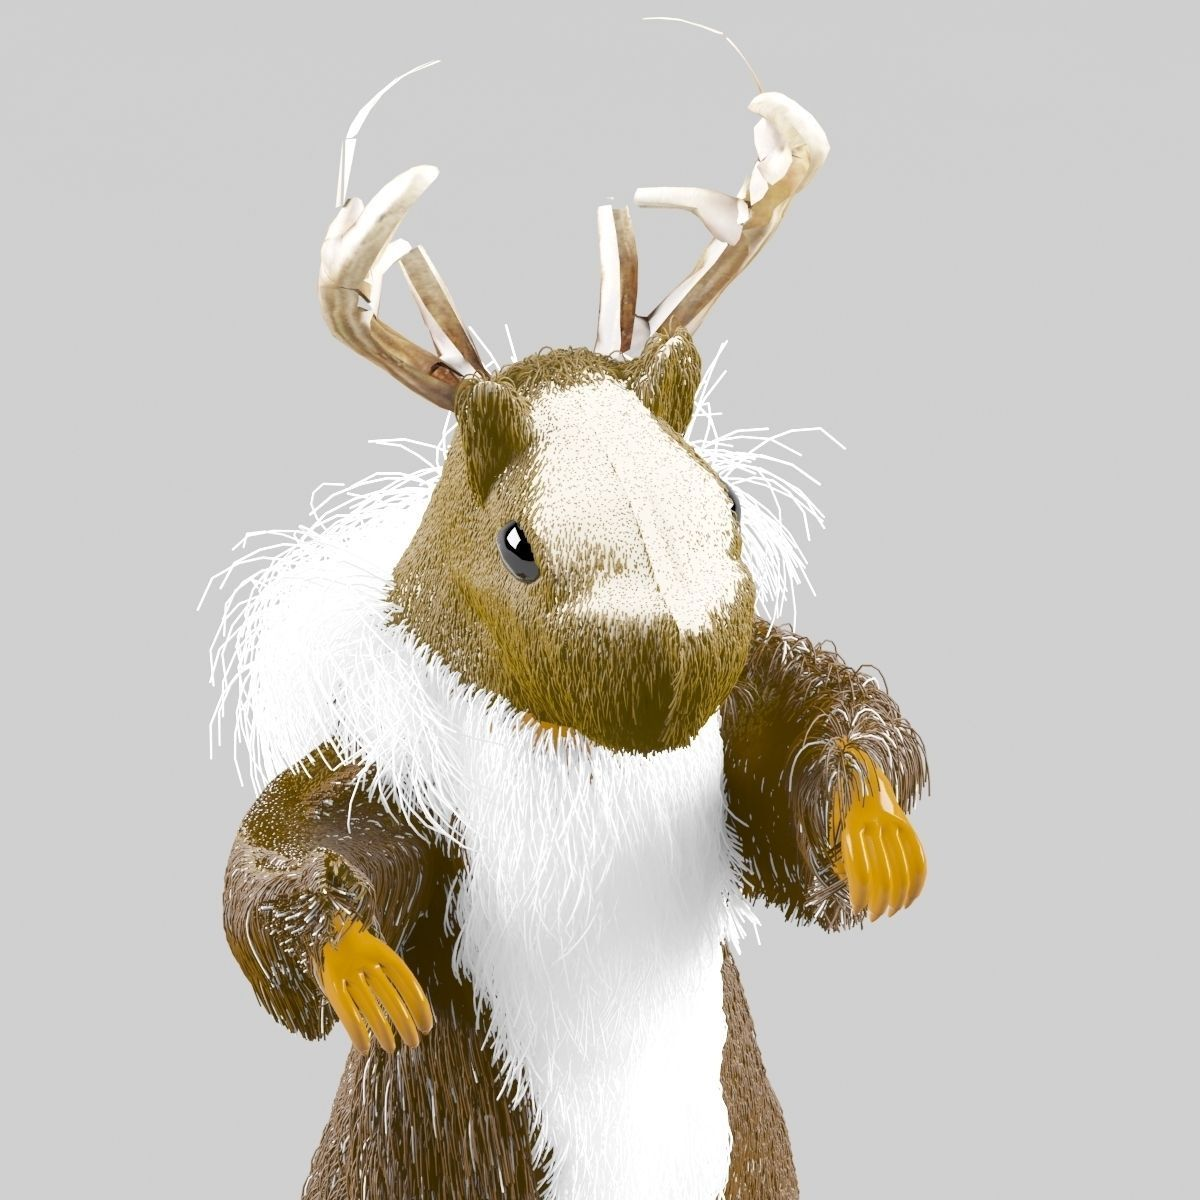 Prairie-deer fantasy creature 3D model